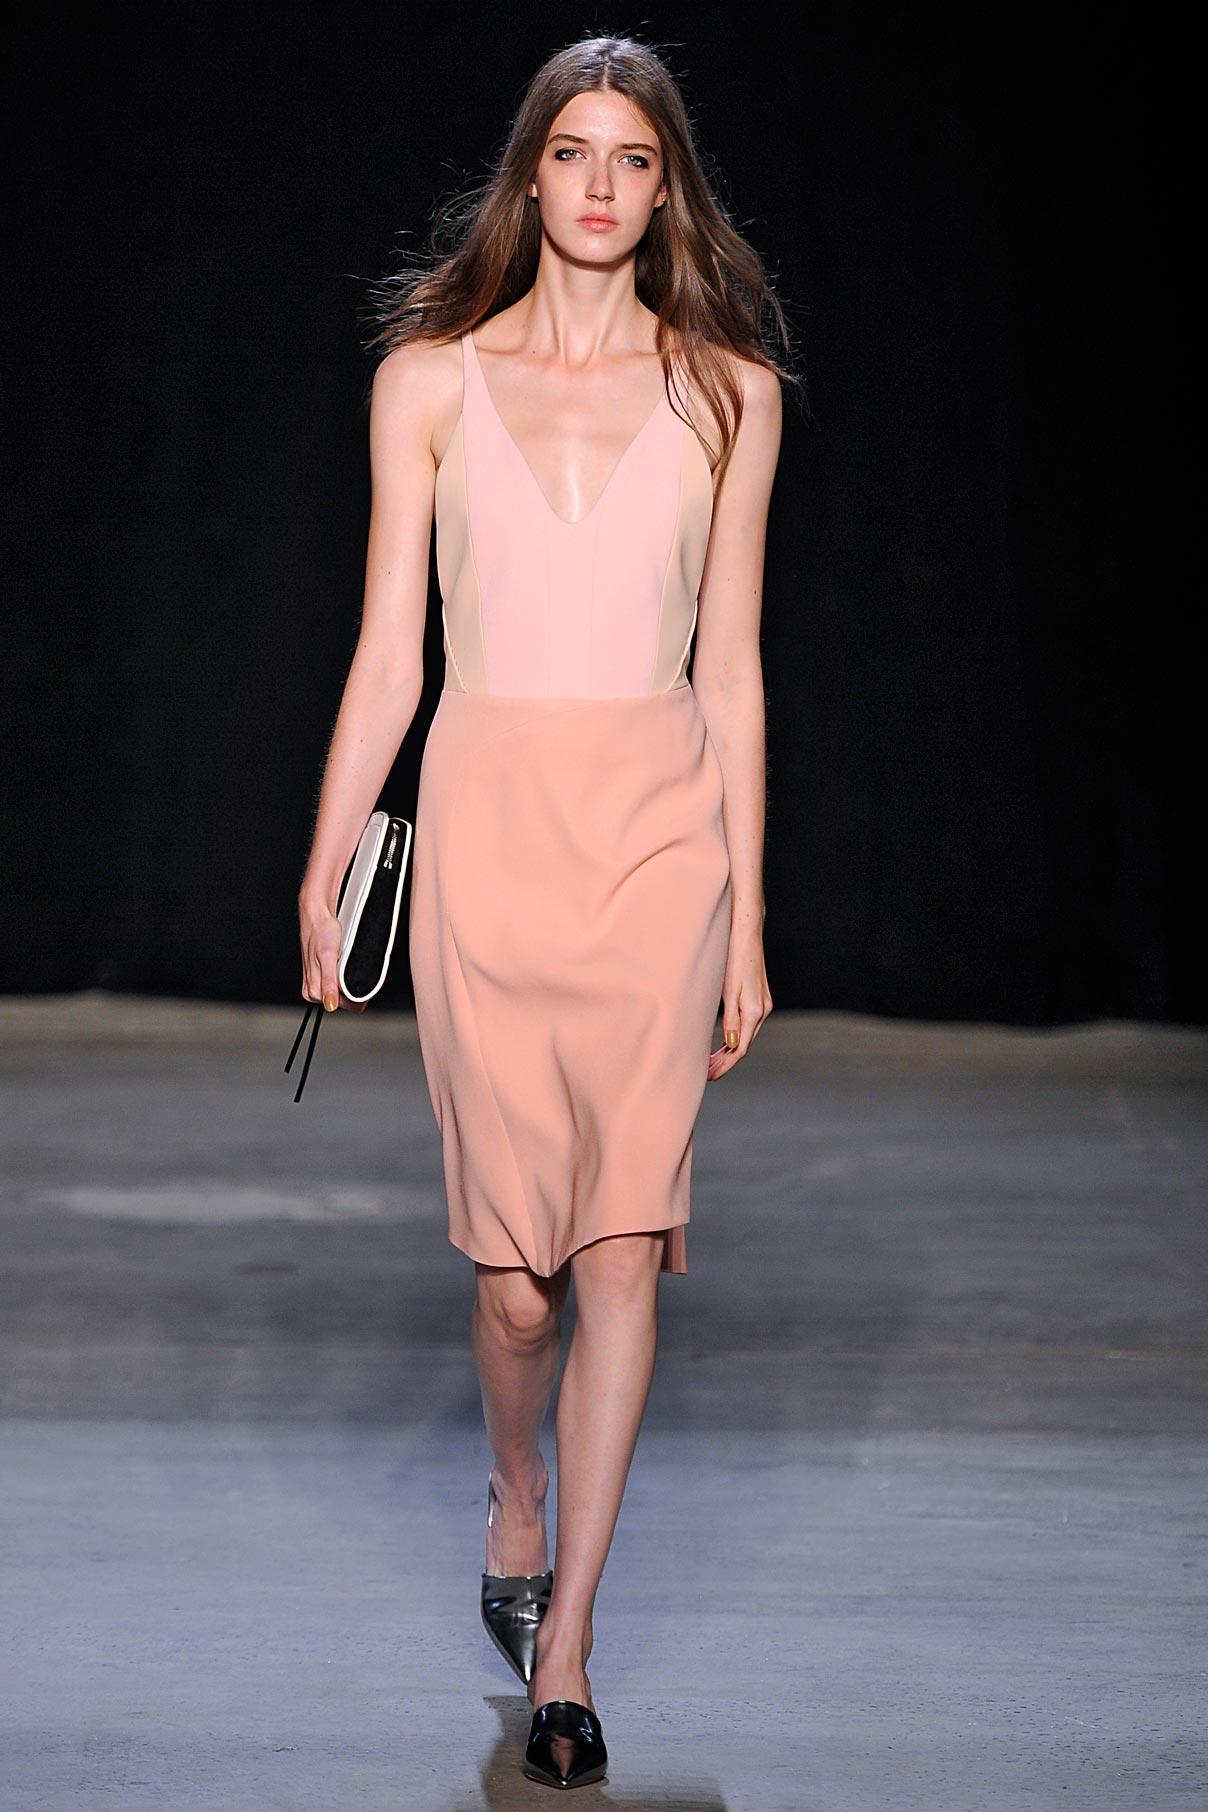 Look 5 Blush/pink/nude tank dress.